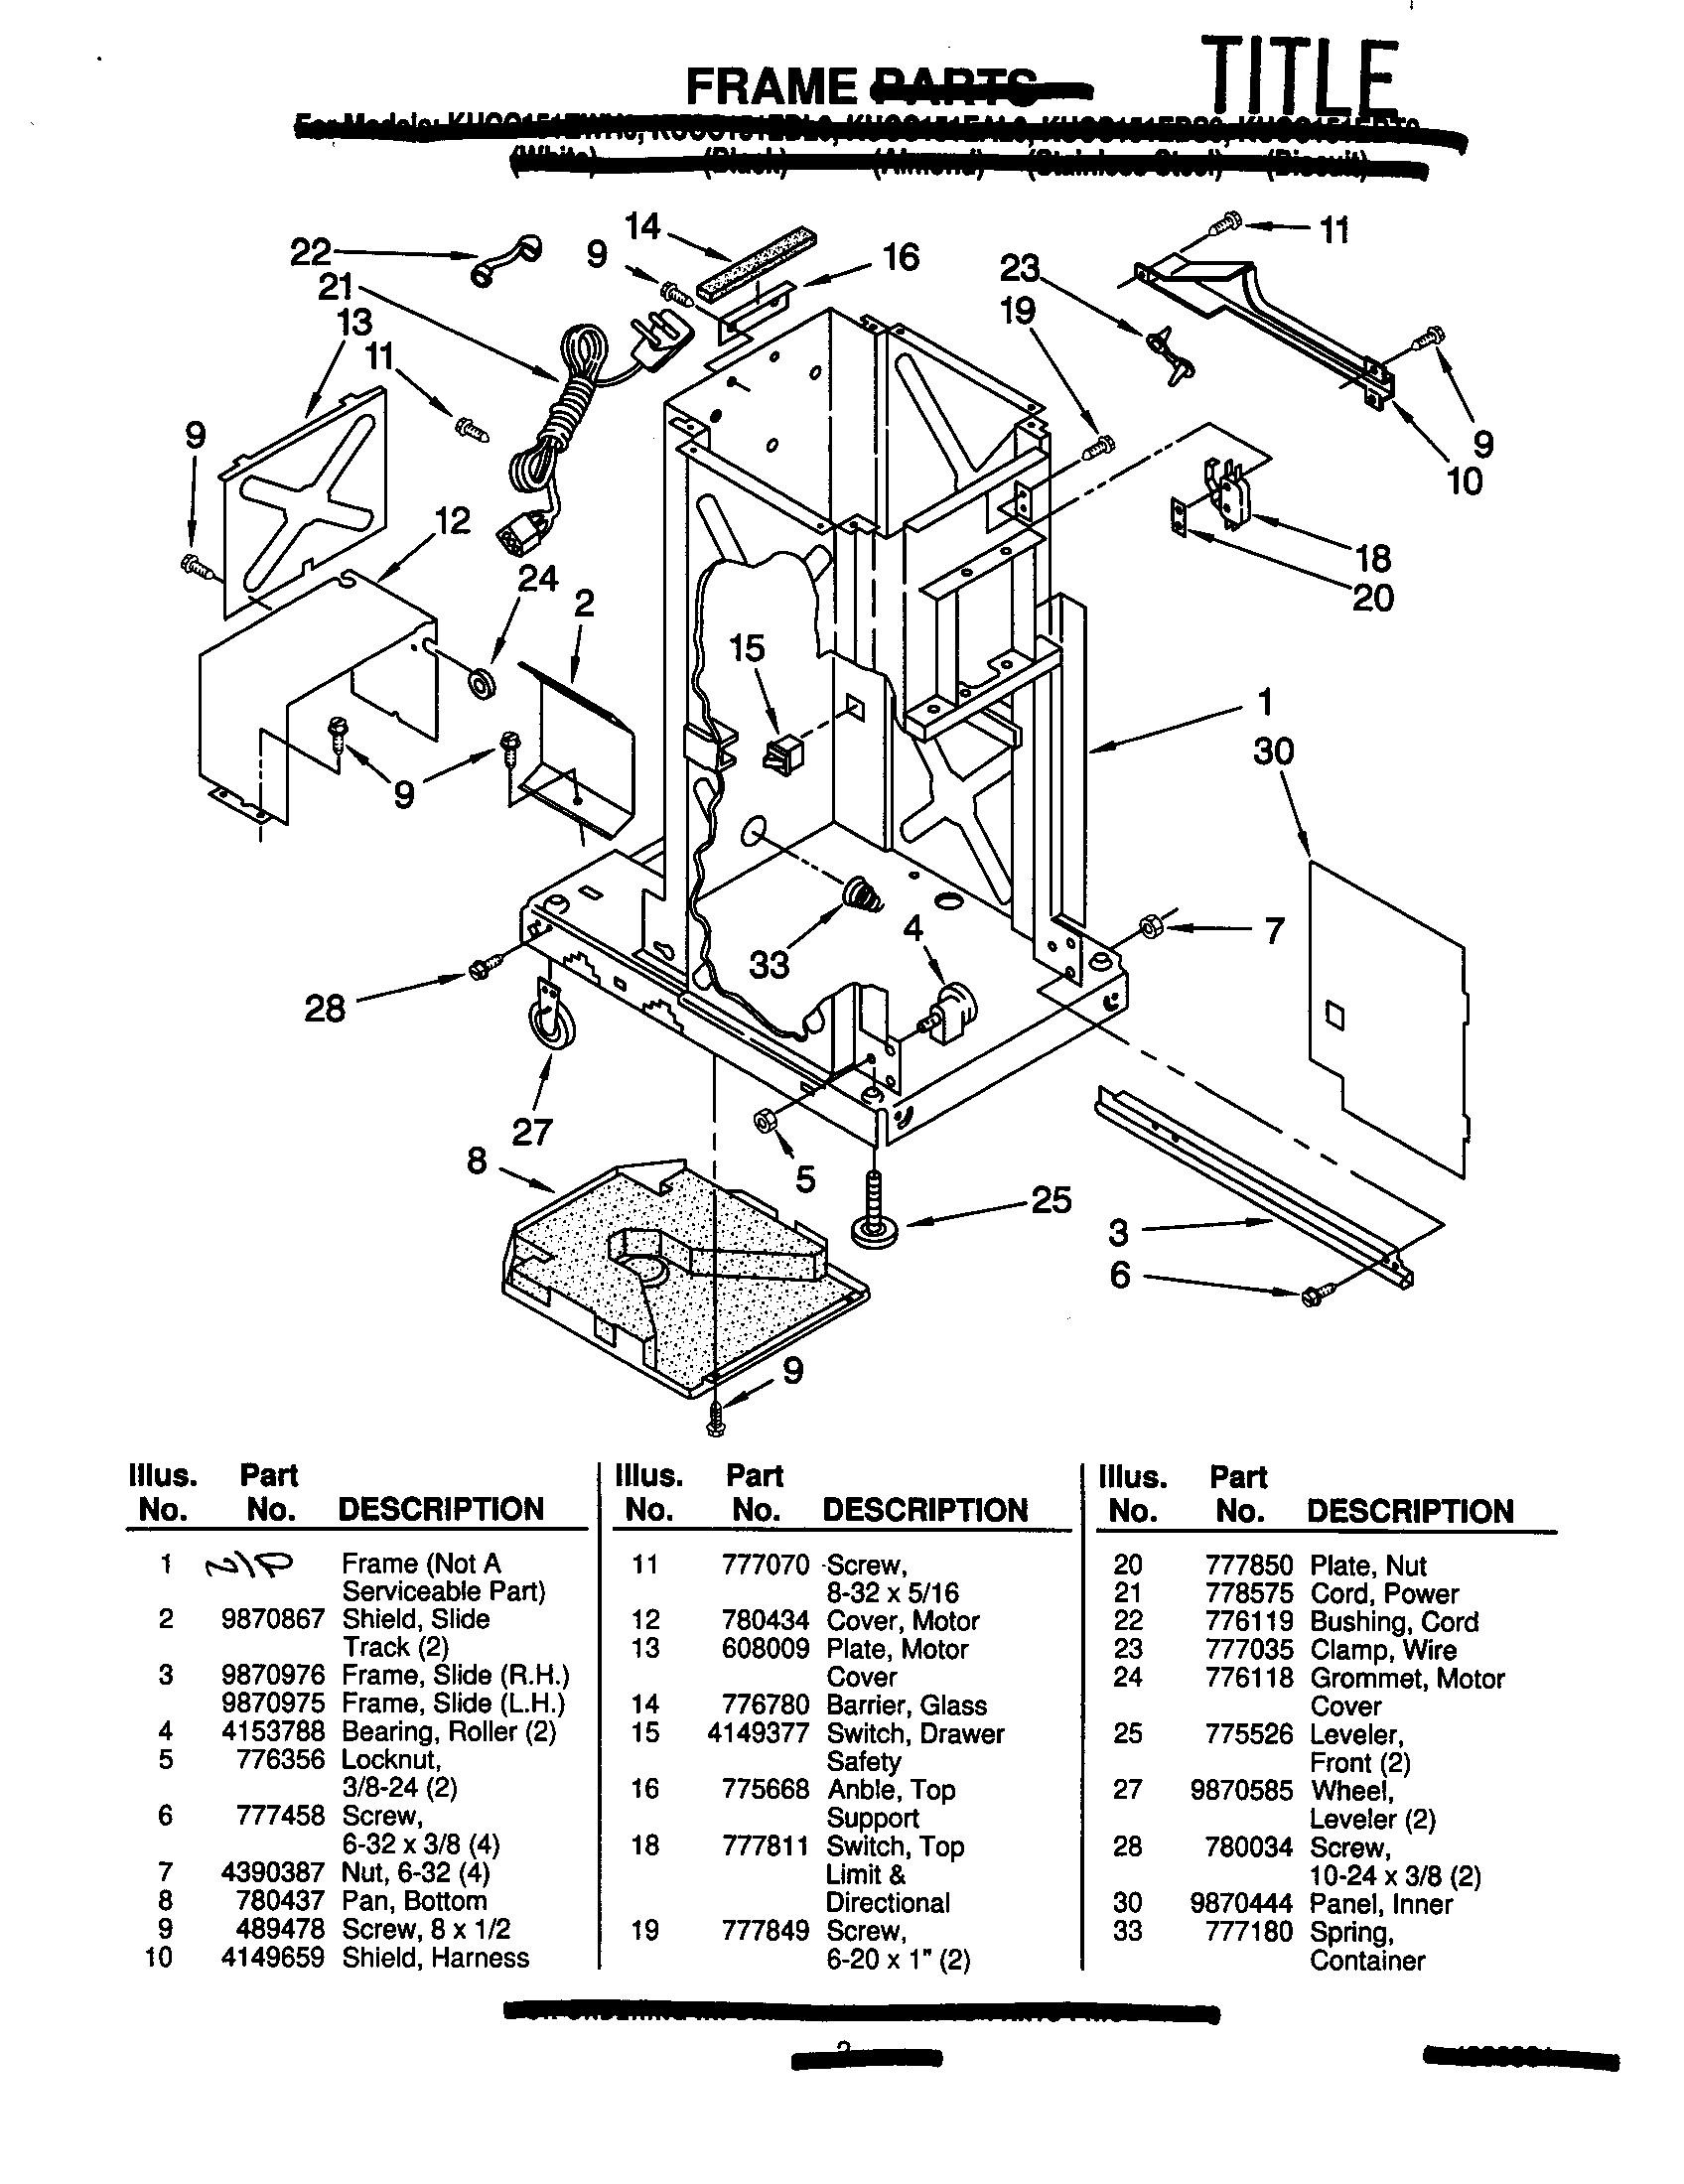 Ge Xl44 Parts Diagram Kitchenaid Model Kucc151ewh0 Pactors Genuine Parts Of Ge Xl44 Parts Diagram